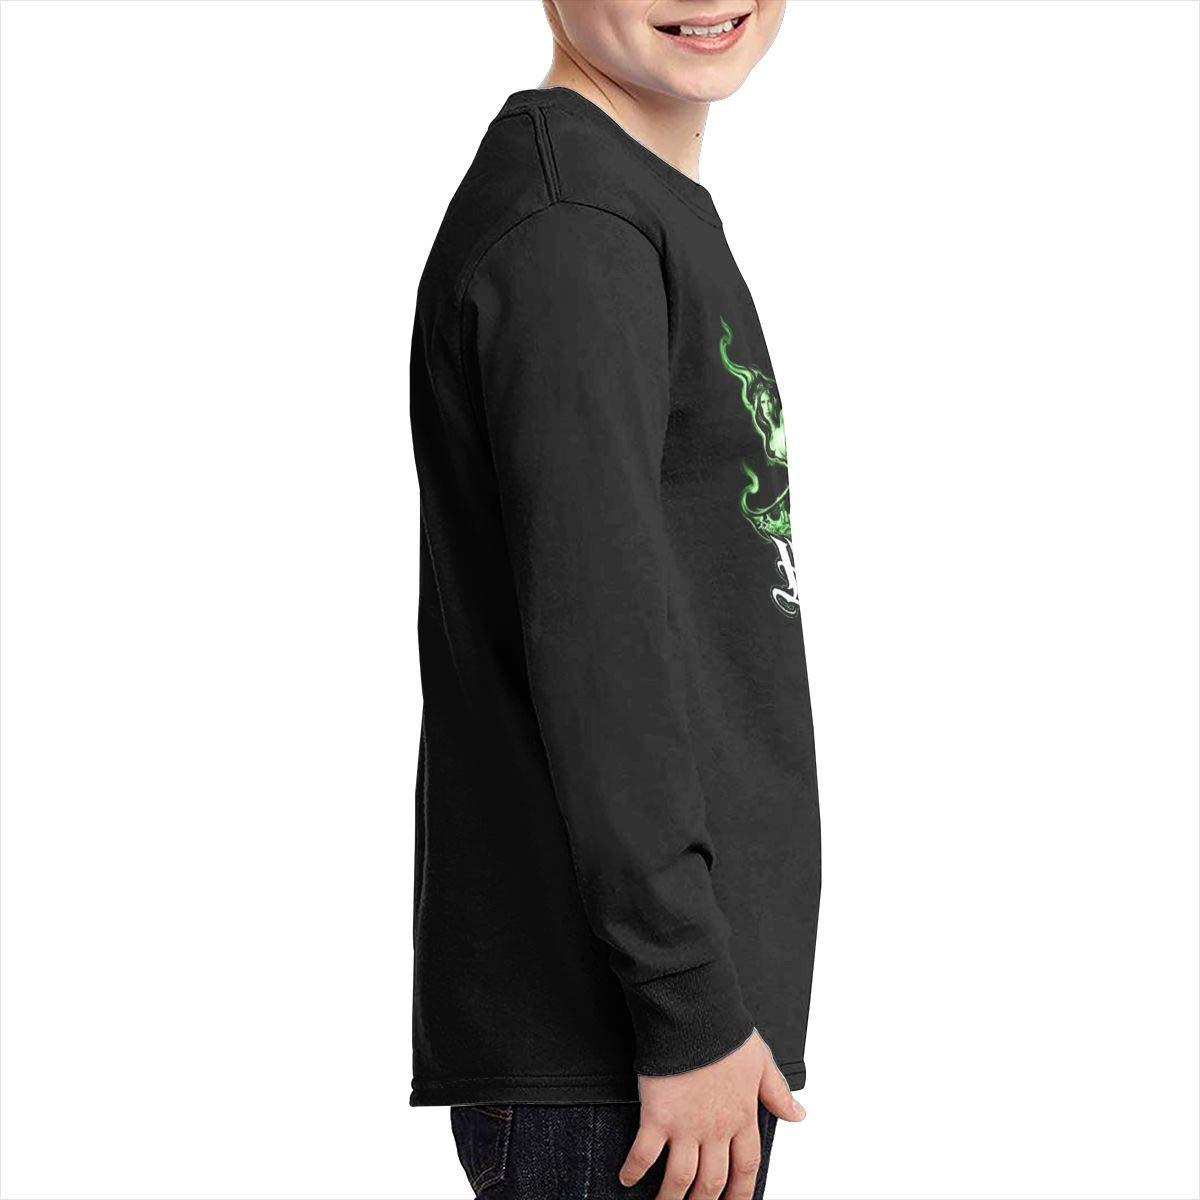 Onlybabycare Reefer Marijuana Cannabis Weed Man Youth Boy Girl Sport Pullover Sweatshirt Unisex Shirt